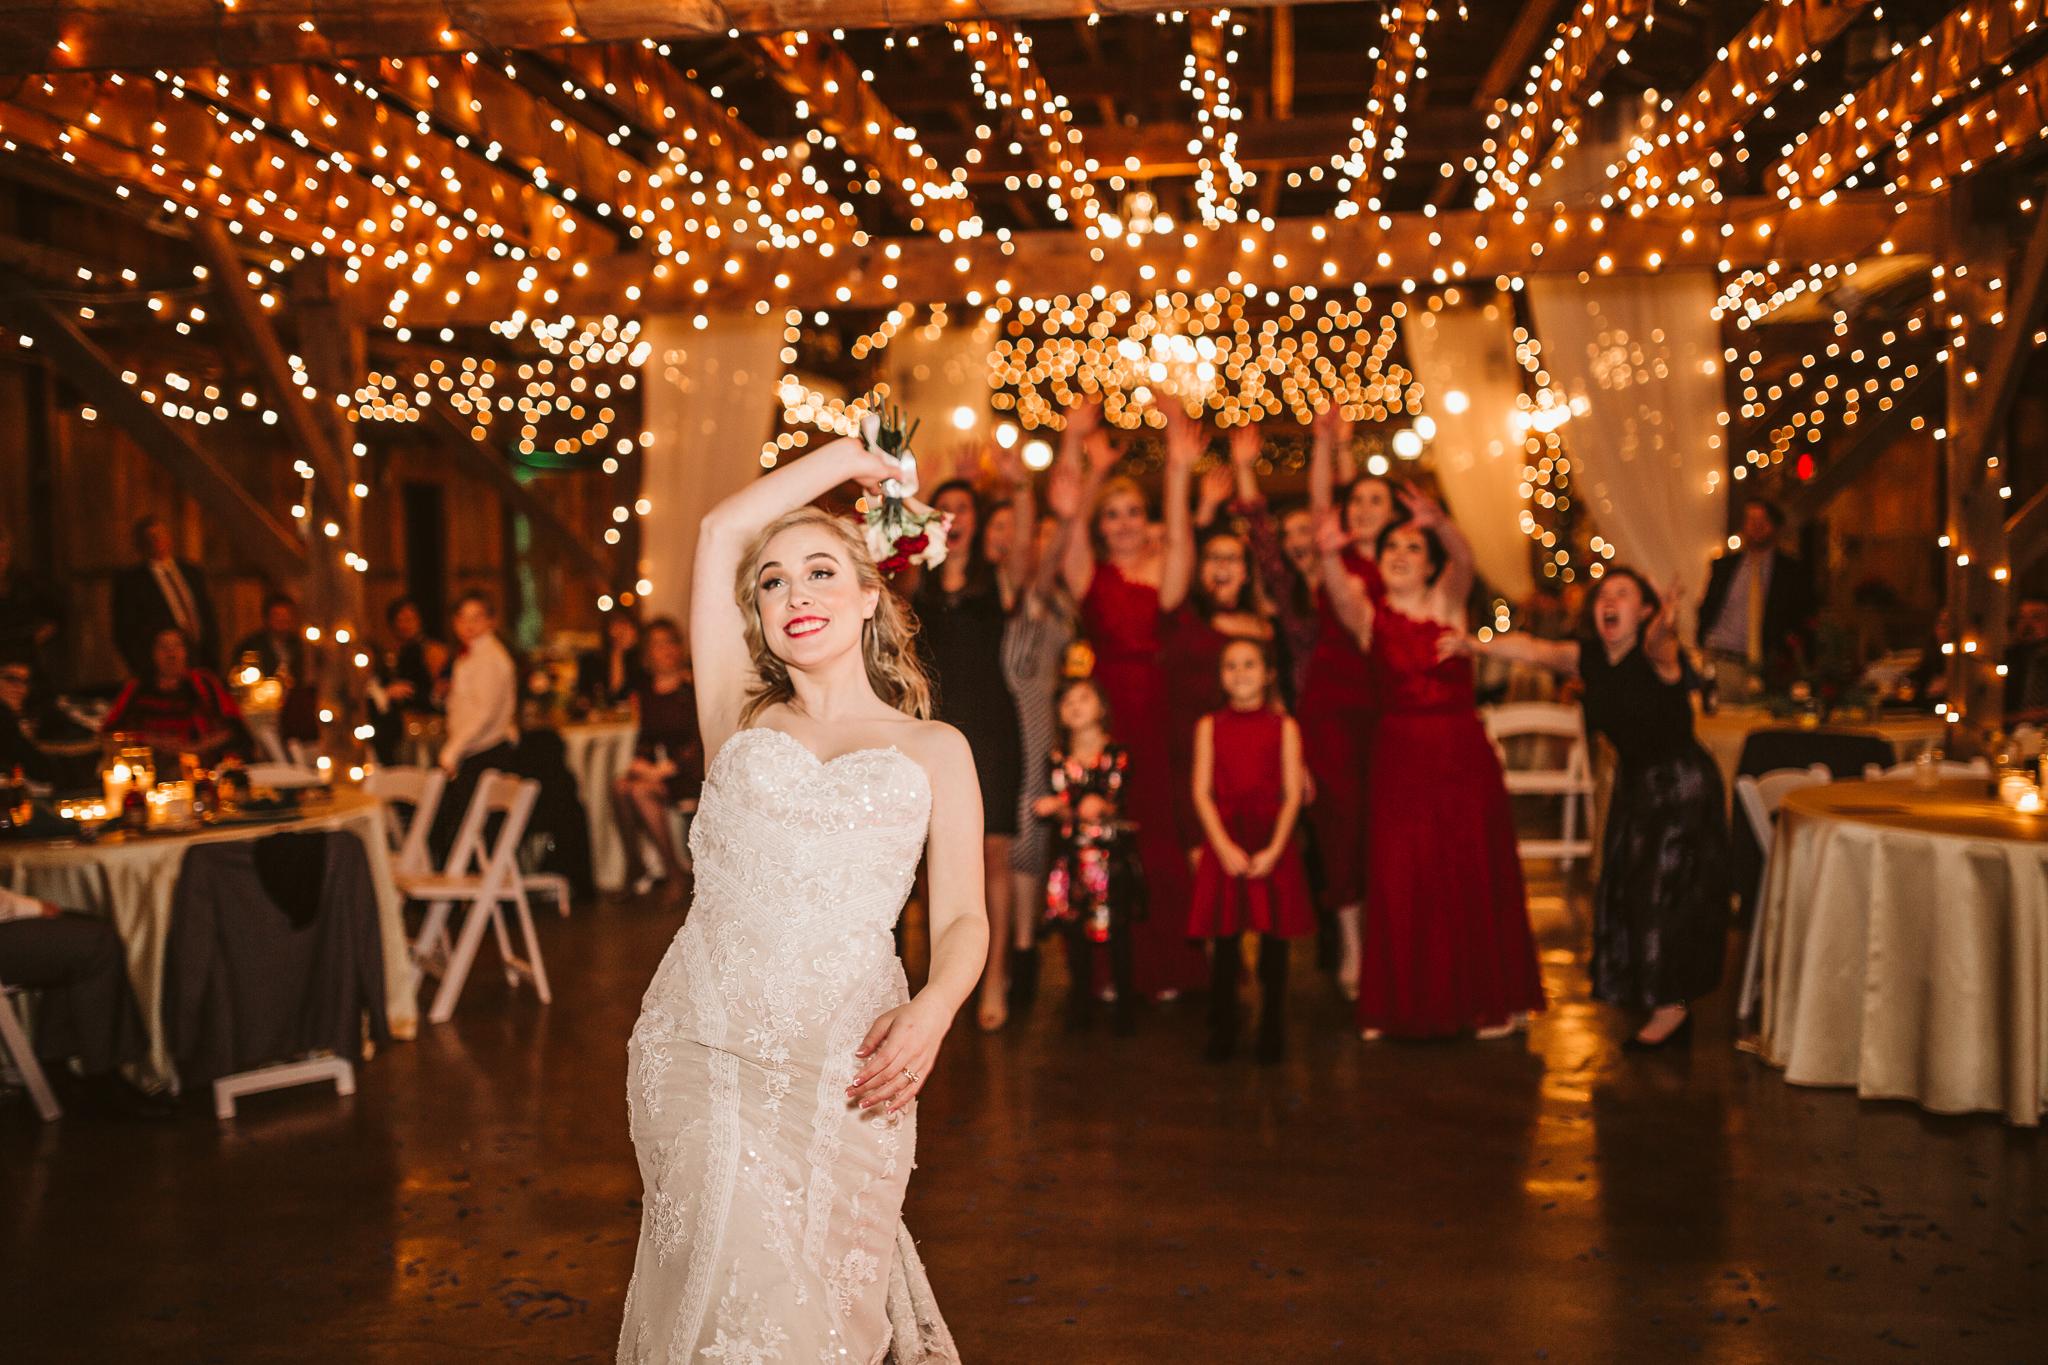 0179 Ariana Jordan Photo - Cameron & Lauren's Wedding at Talon Winery  8286.jpg